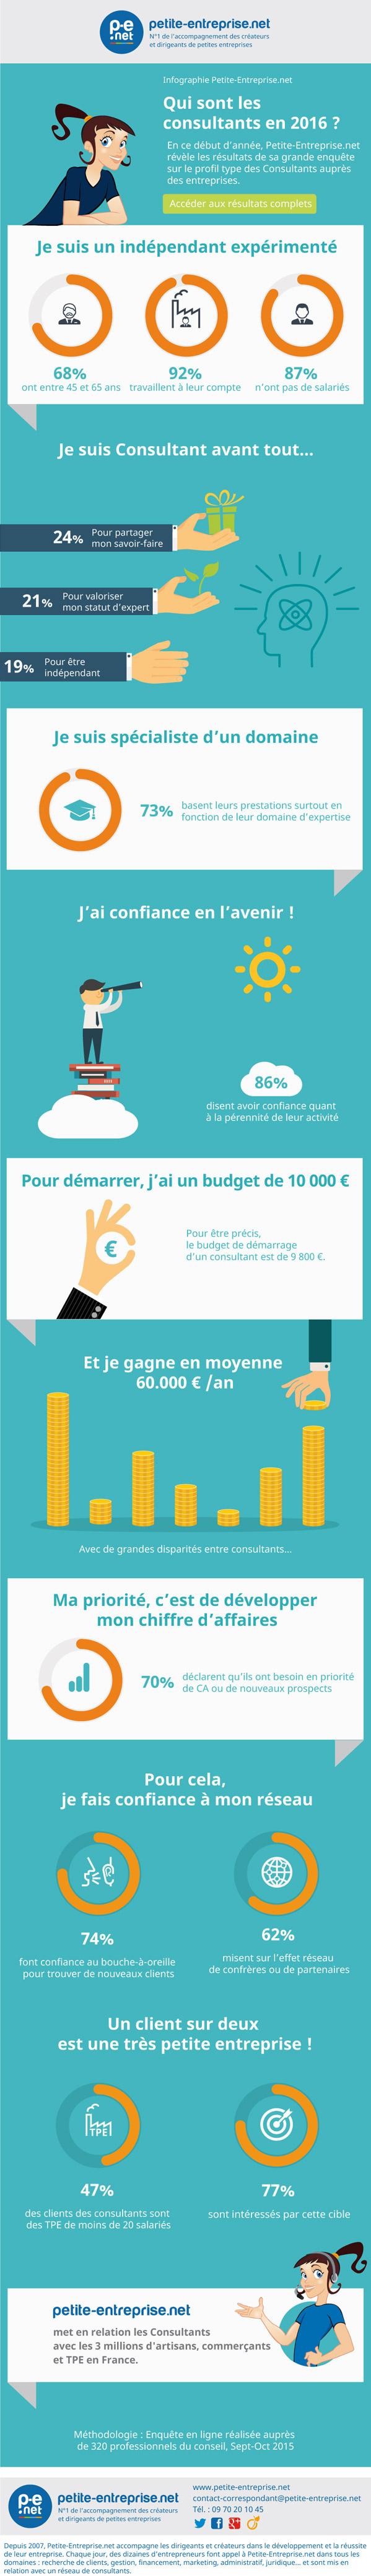 Infographie-Enquete-Consultants.jpg